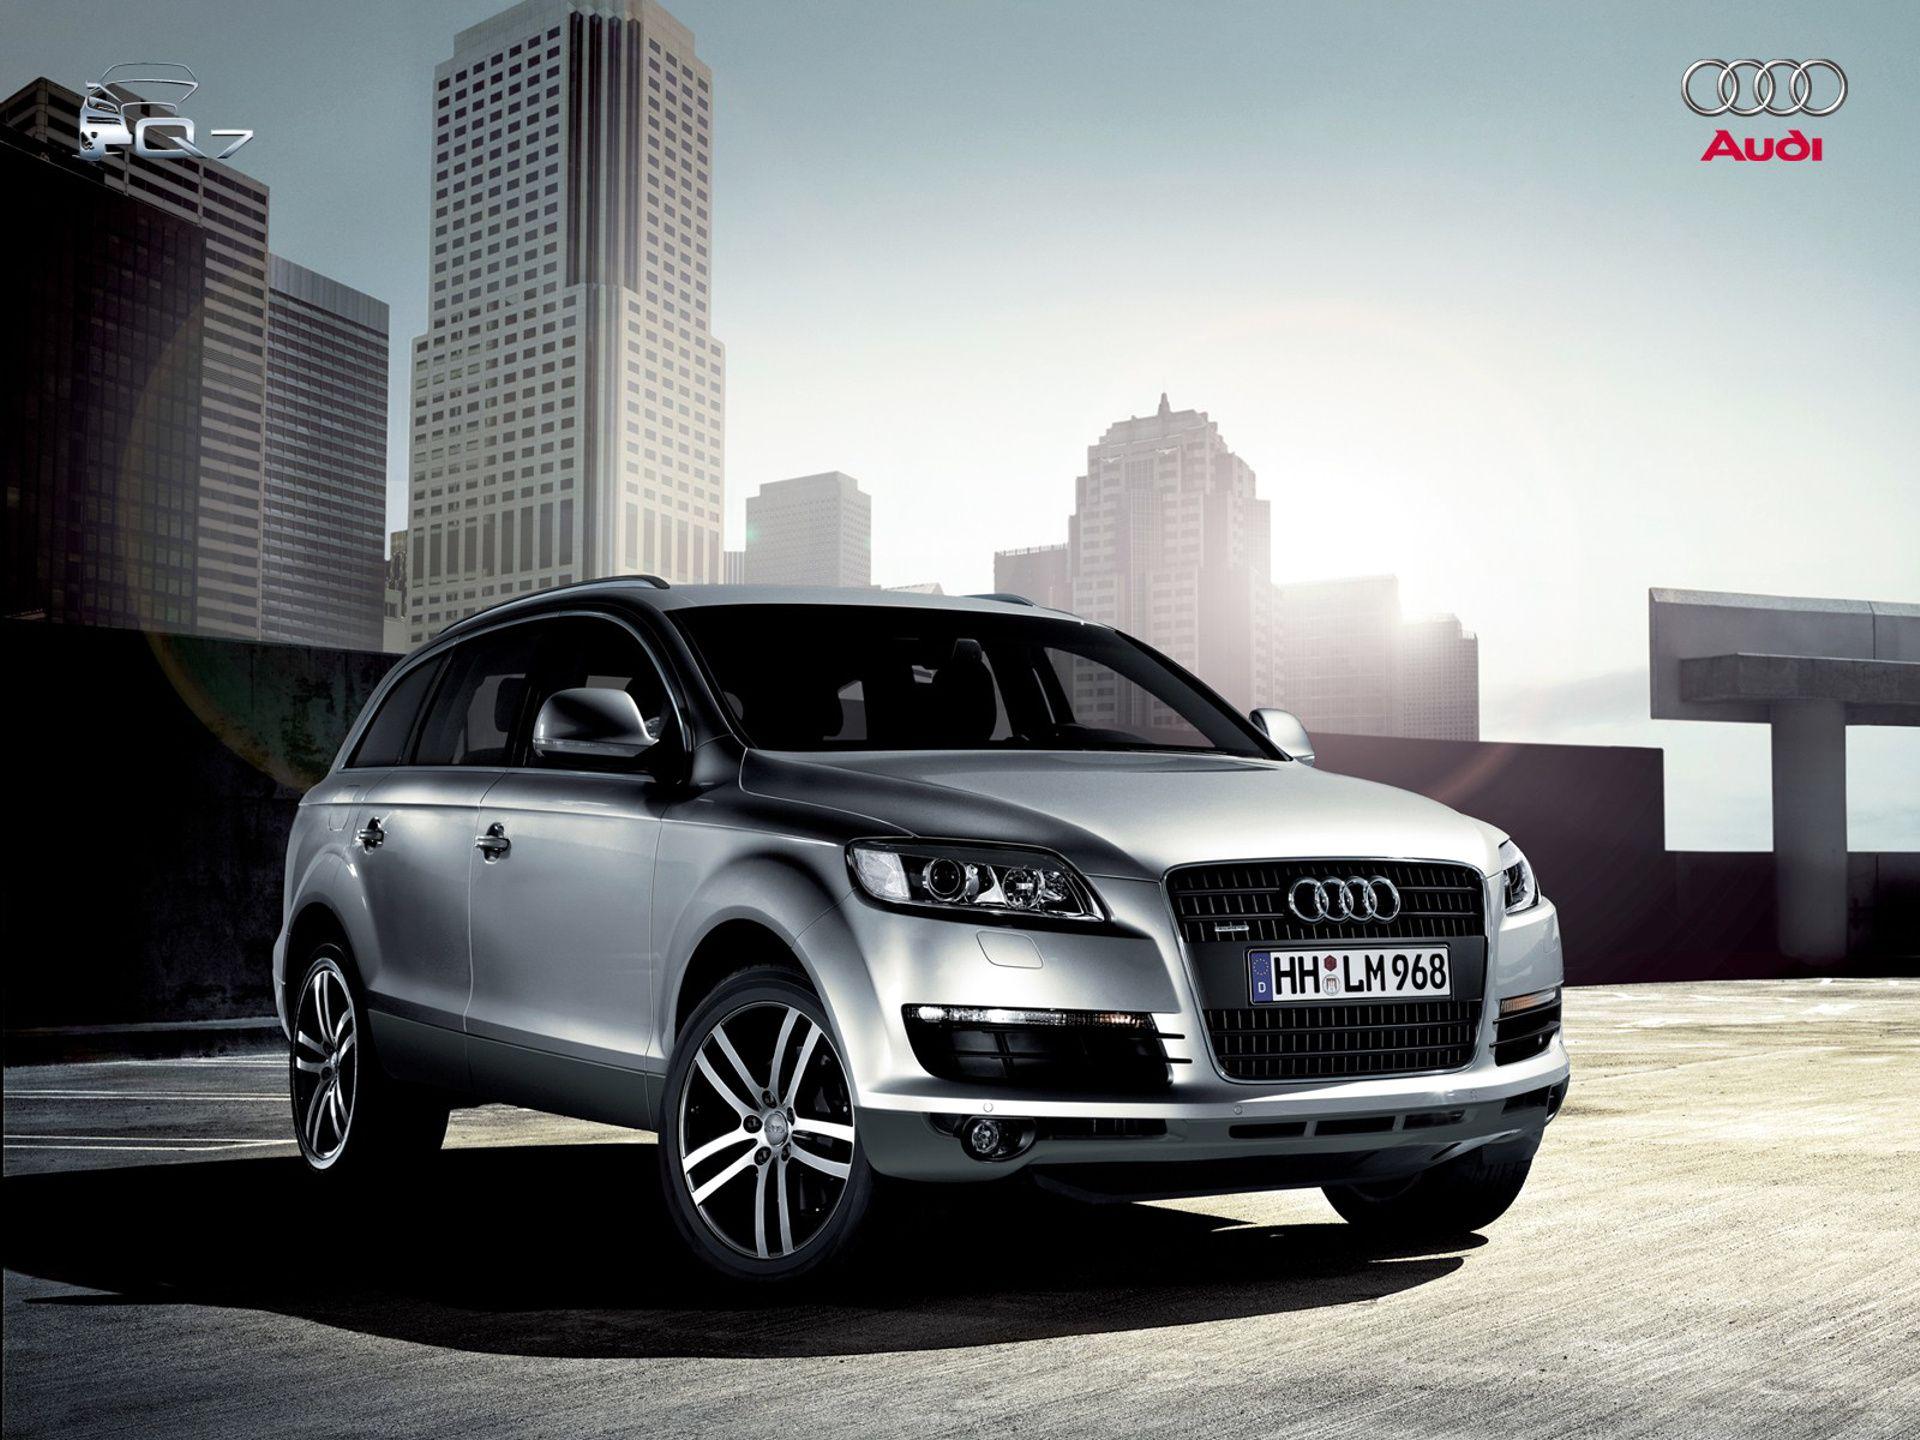 Audi Q7 Fantastic Car Hd Wallpapers Wallpaper Backgrounds Www